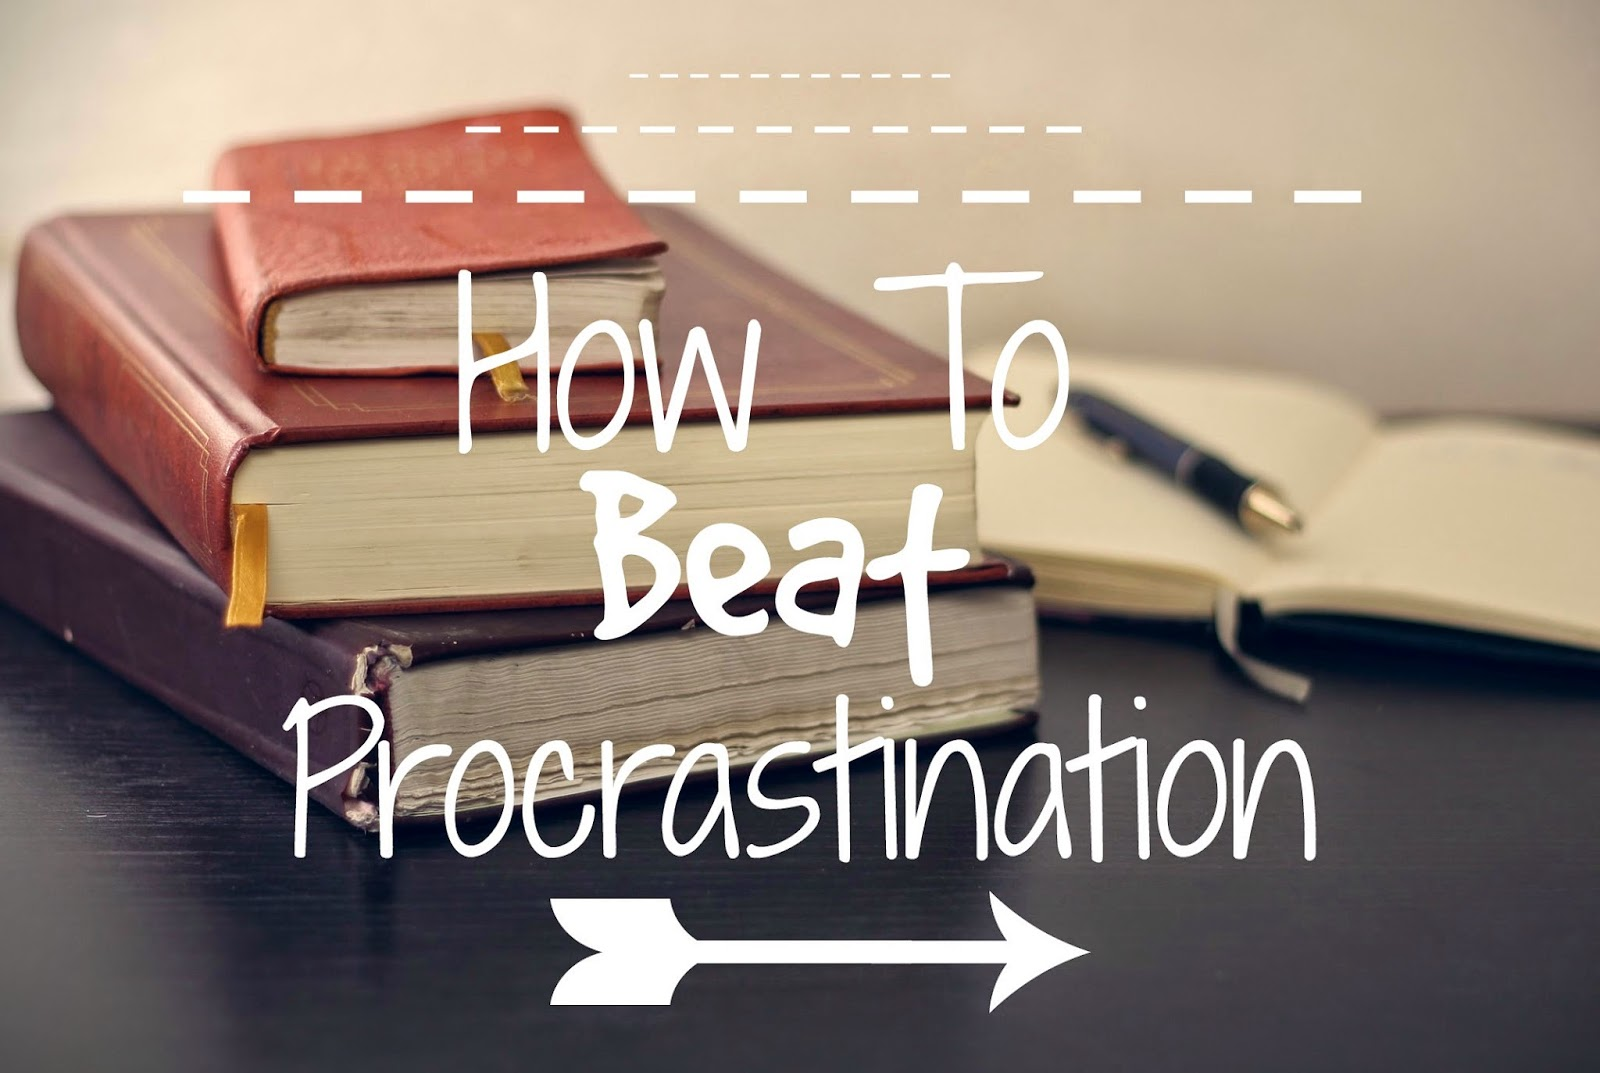 how to beat procrastination Procrastination has been around since the start of modern civilization historical figures like herodotus, leonardo da vinci, pablo picasso, benjamin franklin, eleanor roosevelt, and hundreds of.